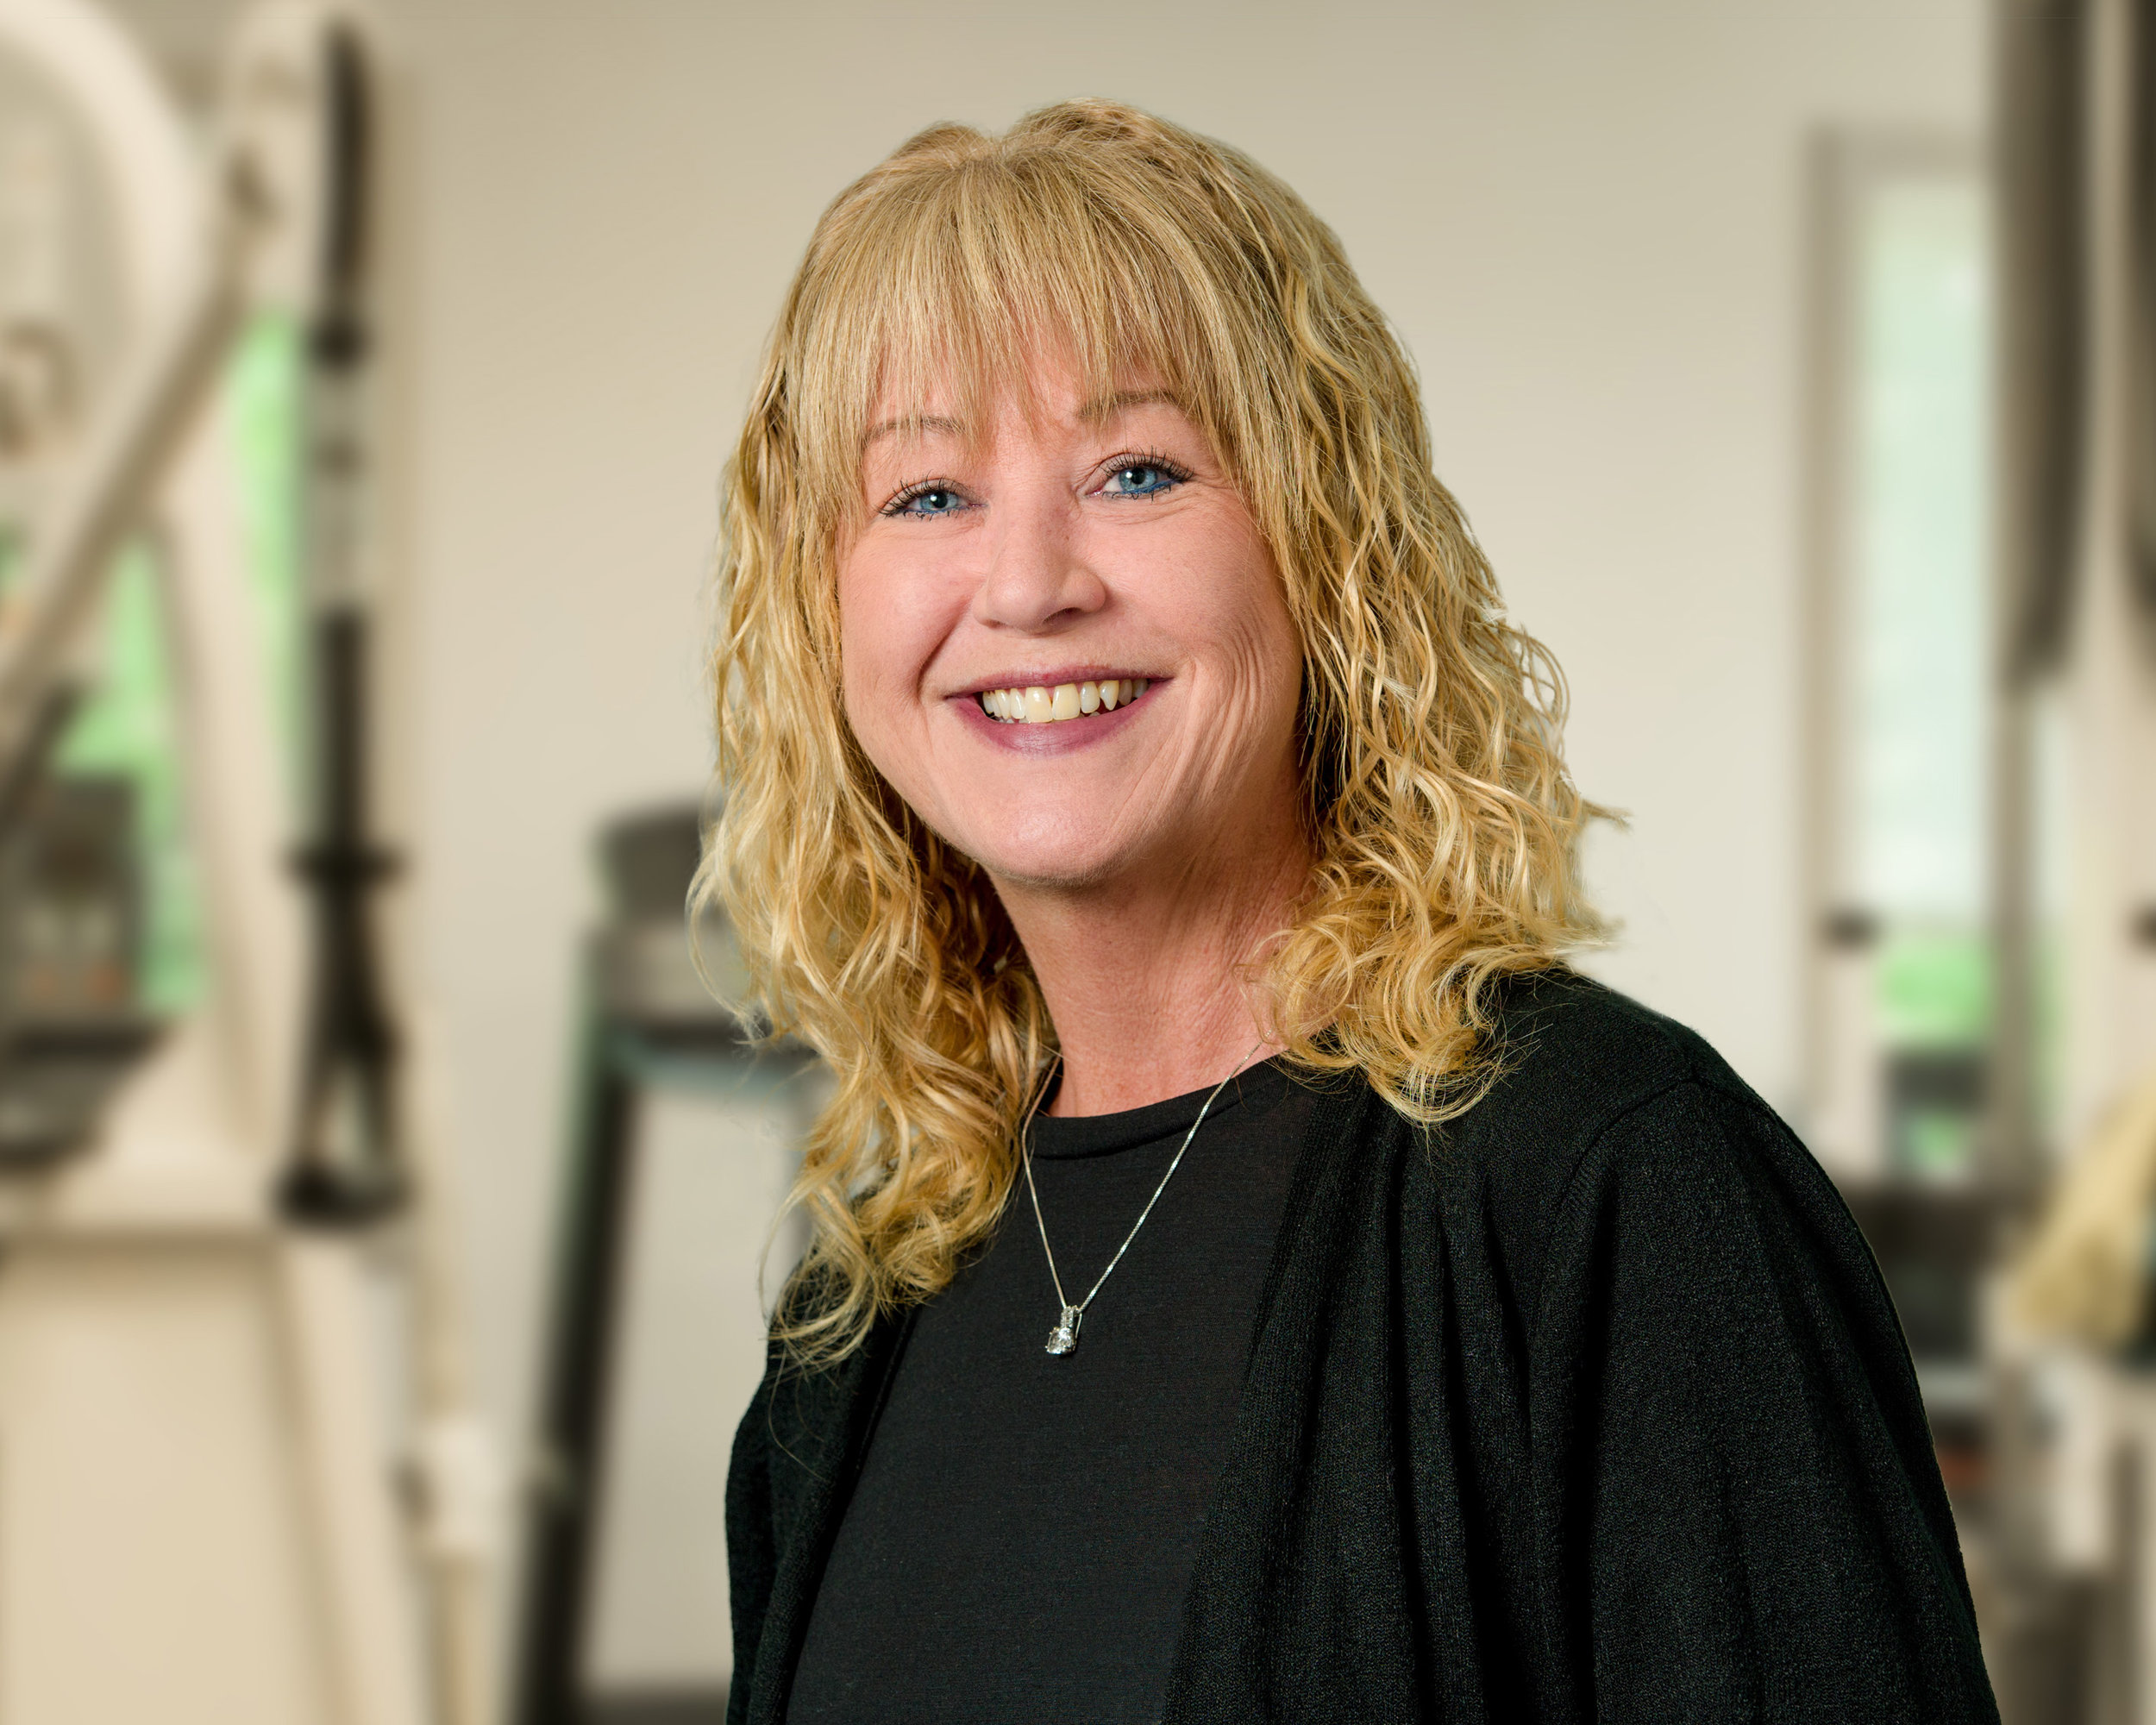 Brenda whitney - Administrative Assistant